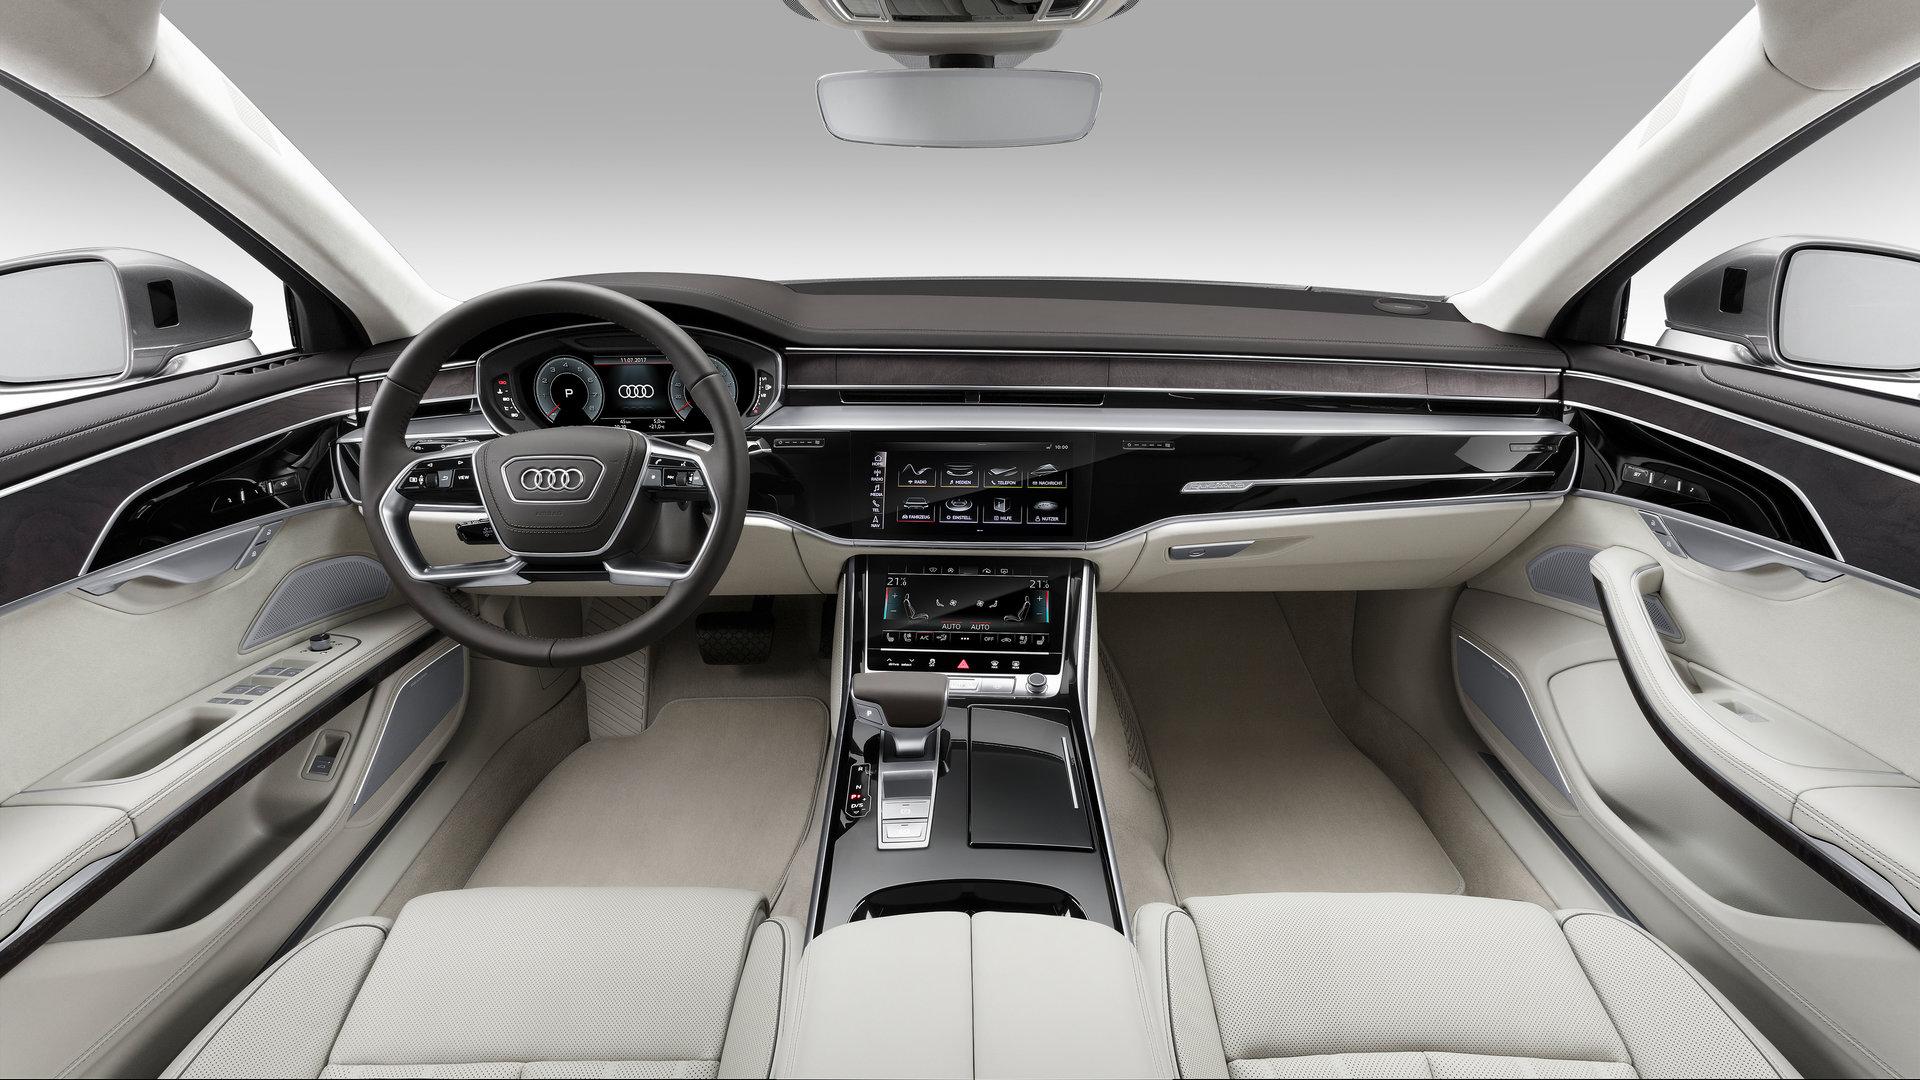 Audi A8 Interieur (Bild 46/69) - ComputerBase